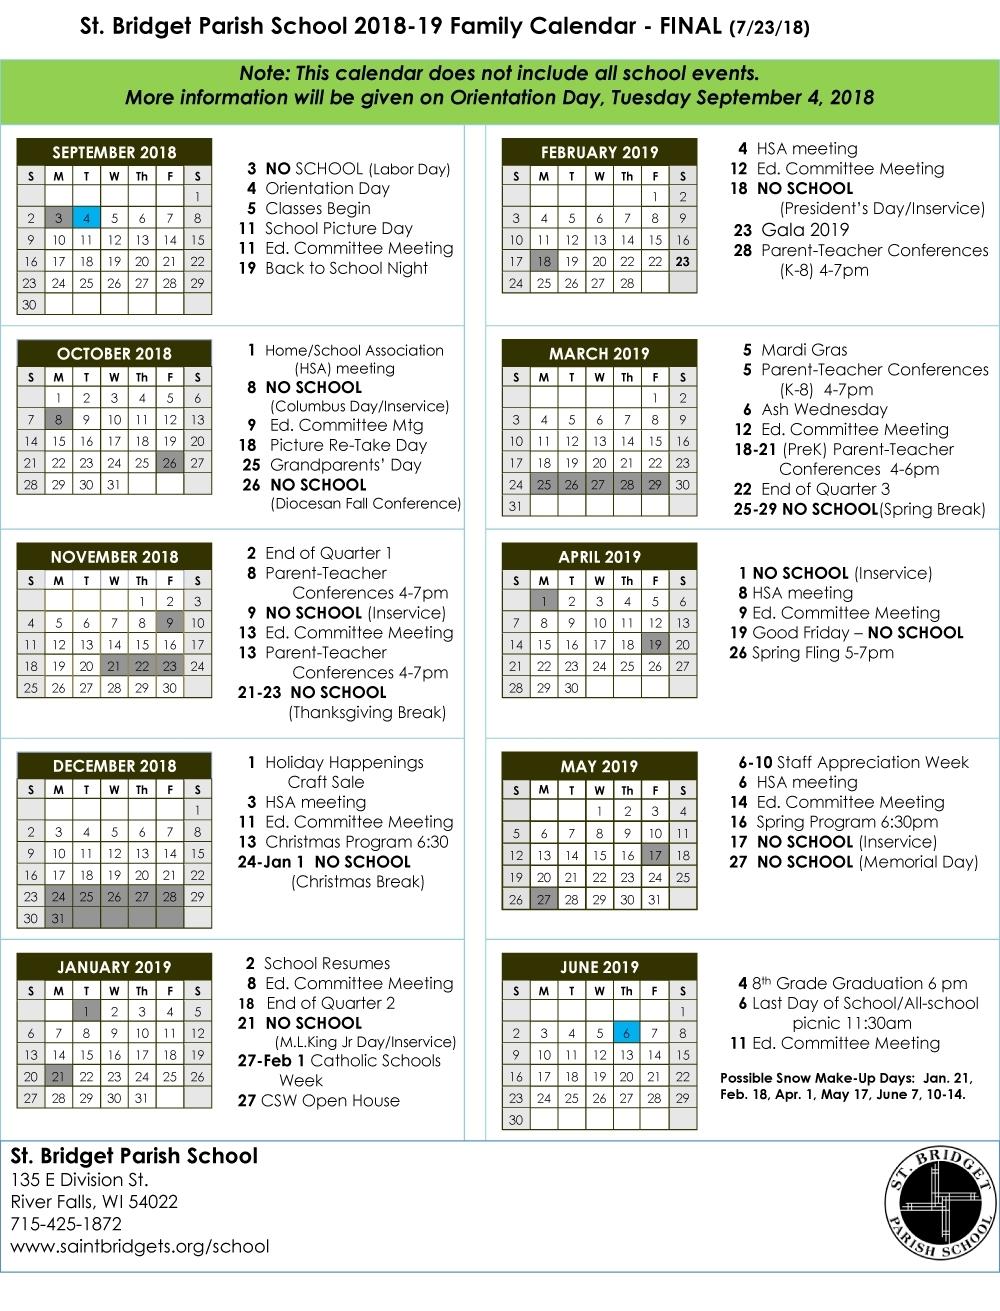 St. Bridget School Calendar - Saint Bridget Catholic Community for Catholic Liturgical Calendar 2020 Pdf